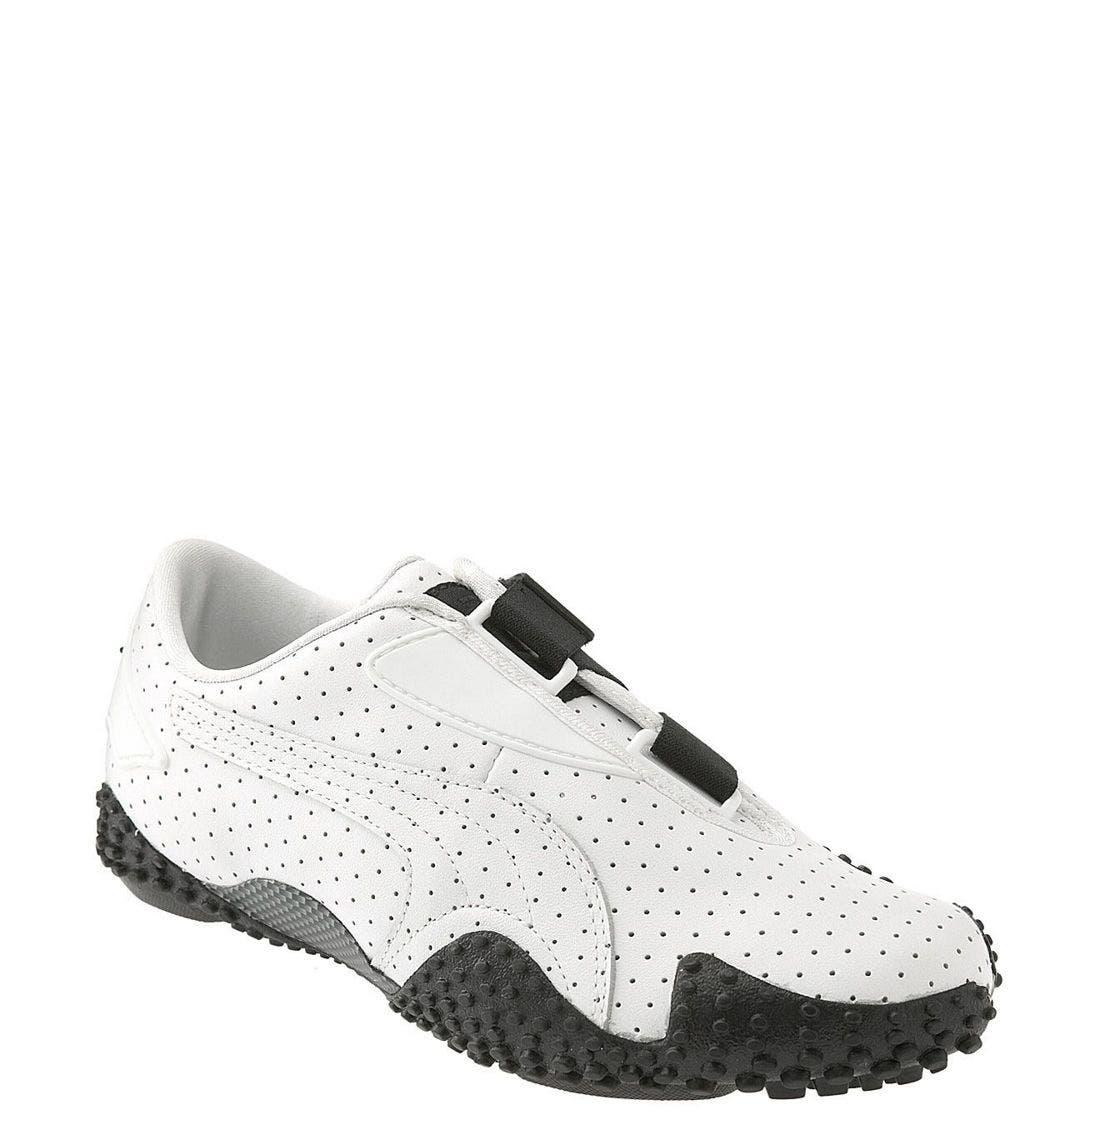 Main Image - PUMA 'Mostro Perf' Sneaker (Women)